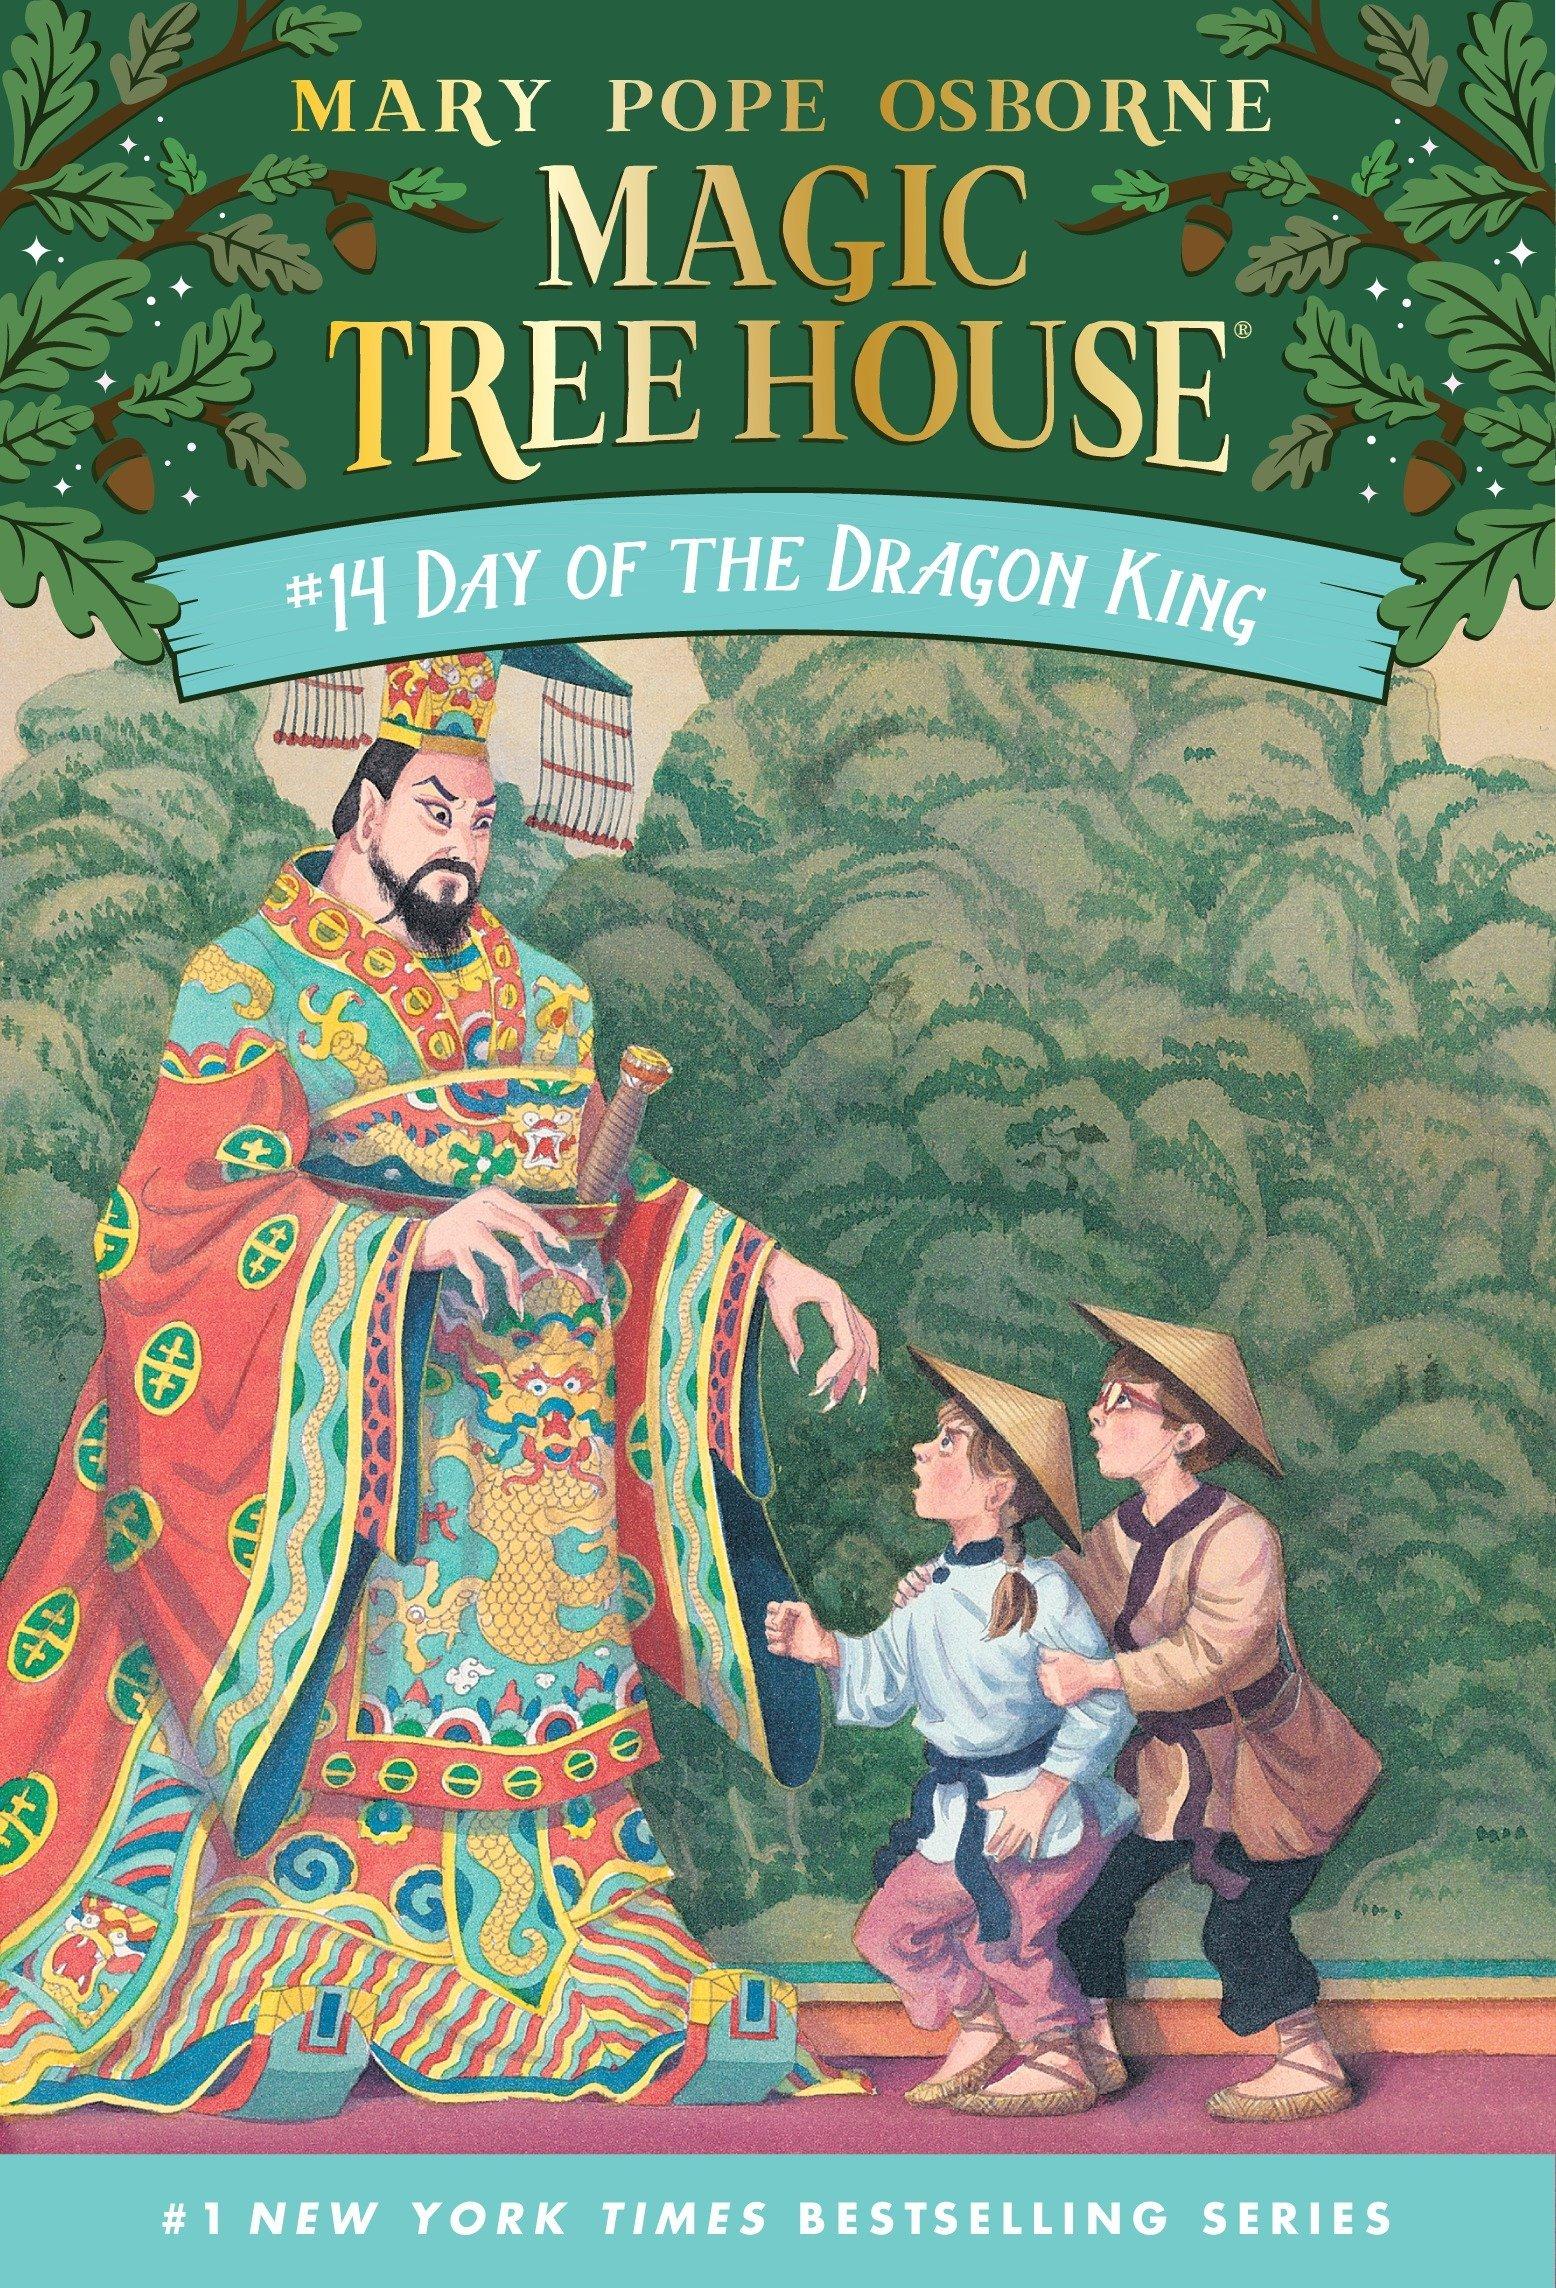 CANCELLED - Magic Tree House Club